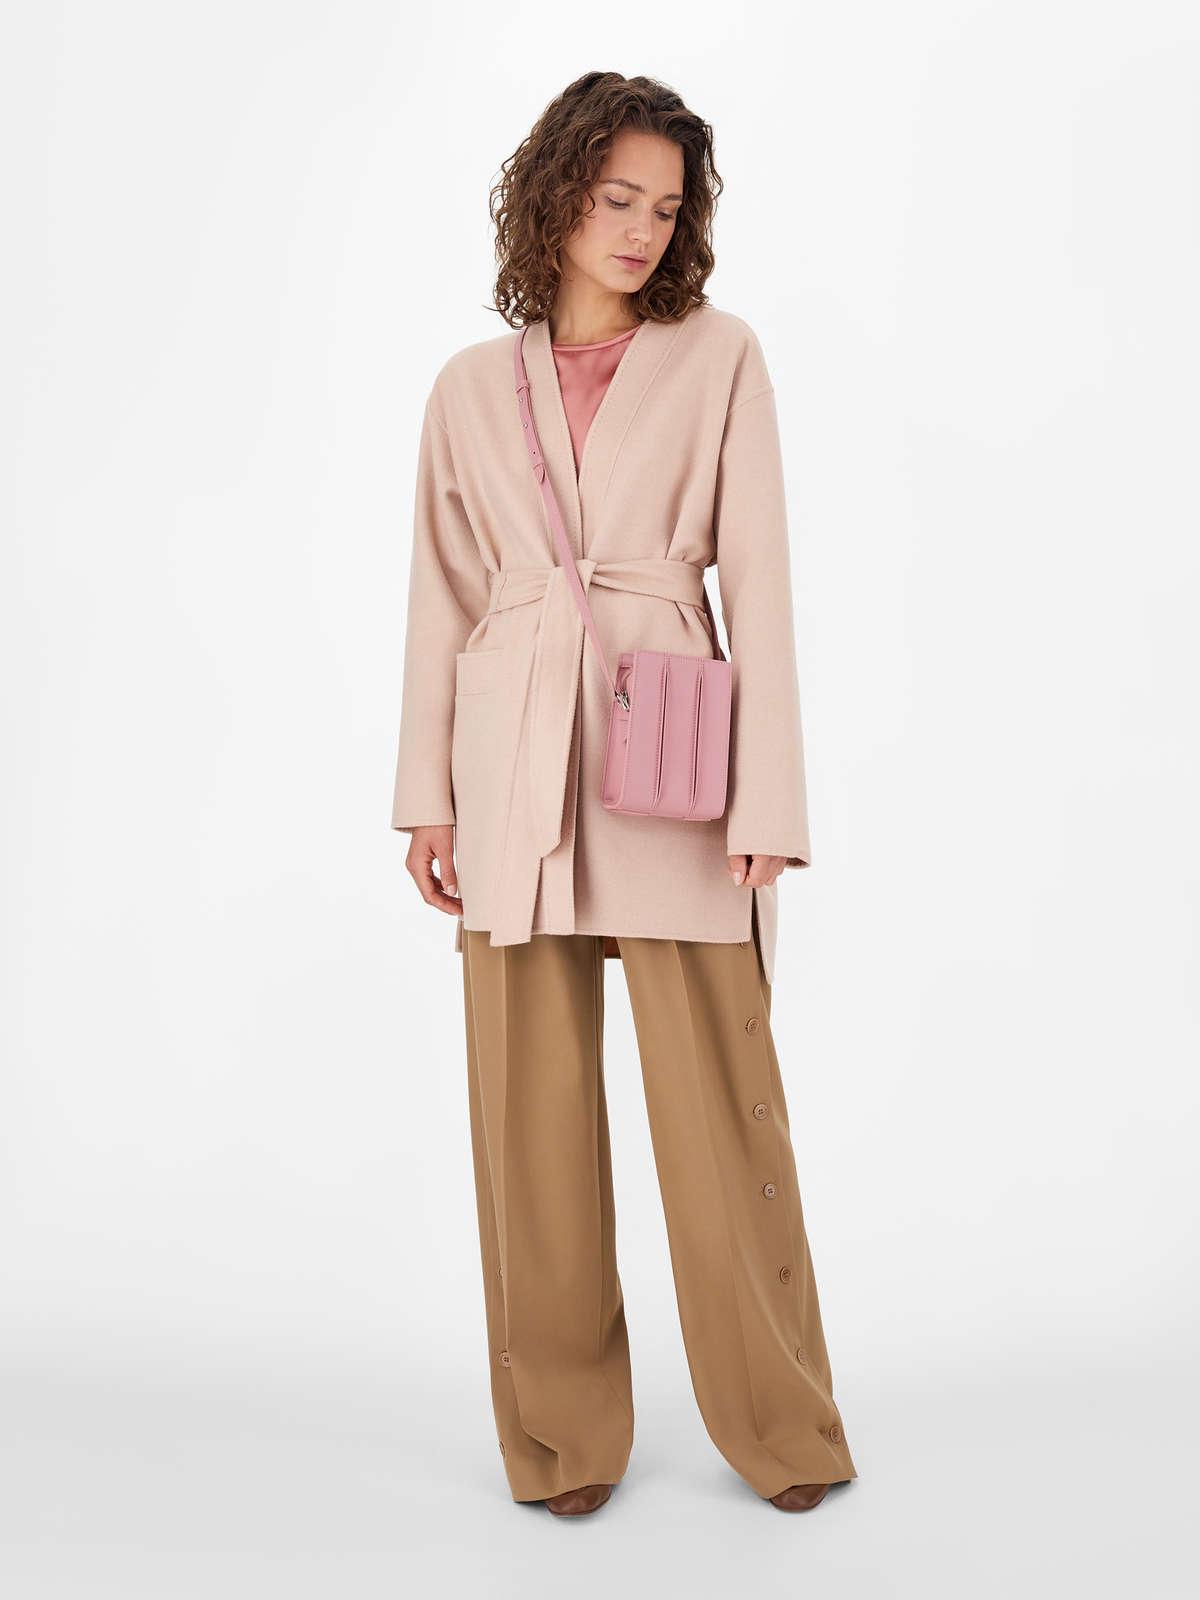 Pure albino camel coat, double hand-stitched - Max Mara